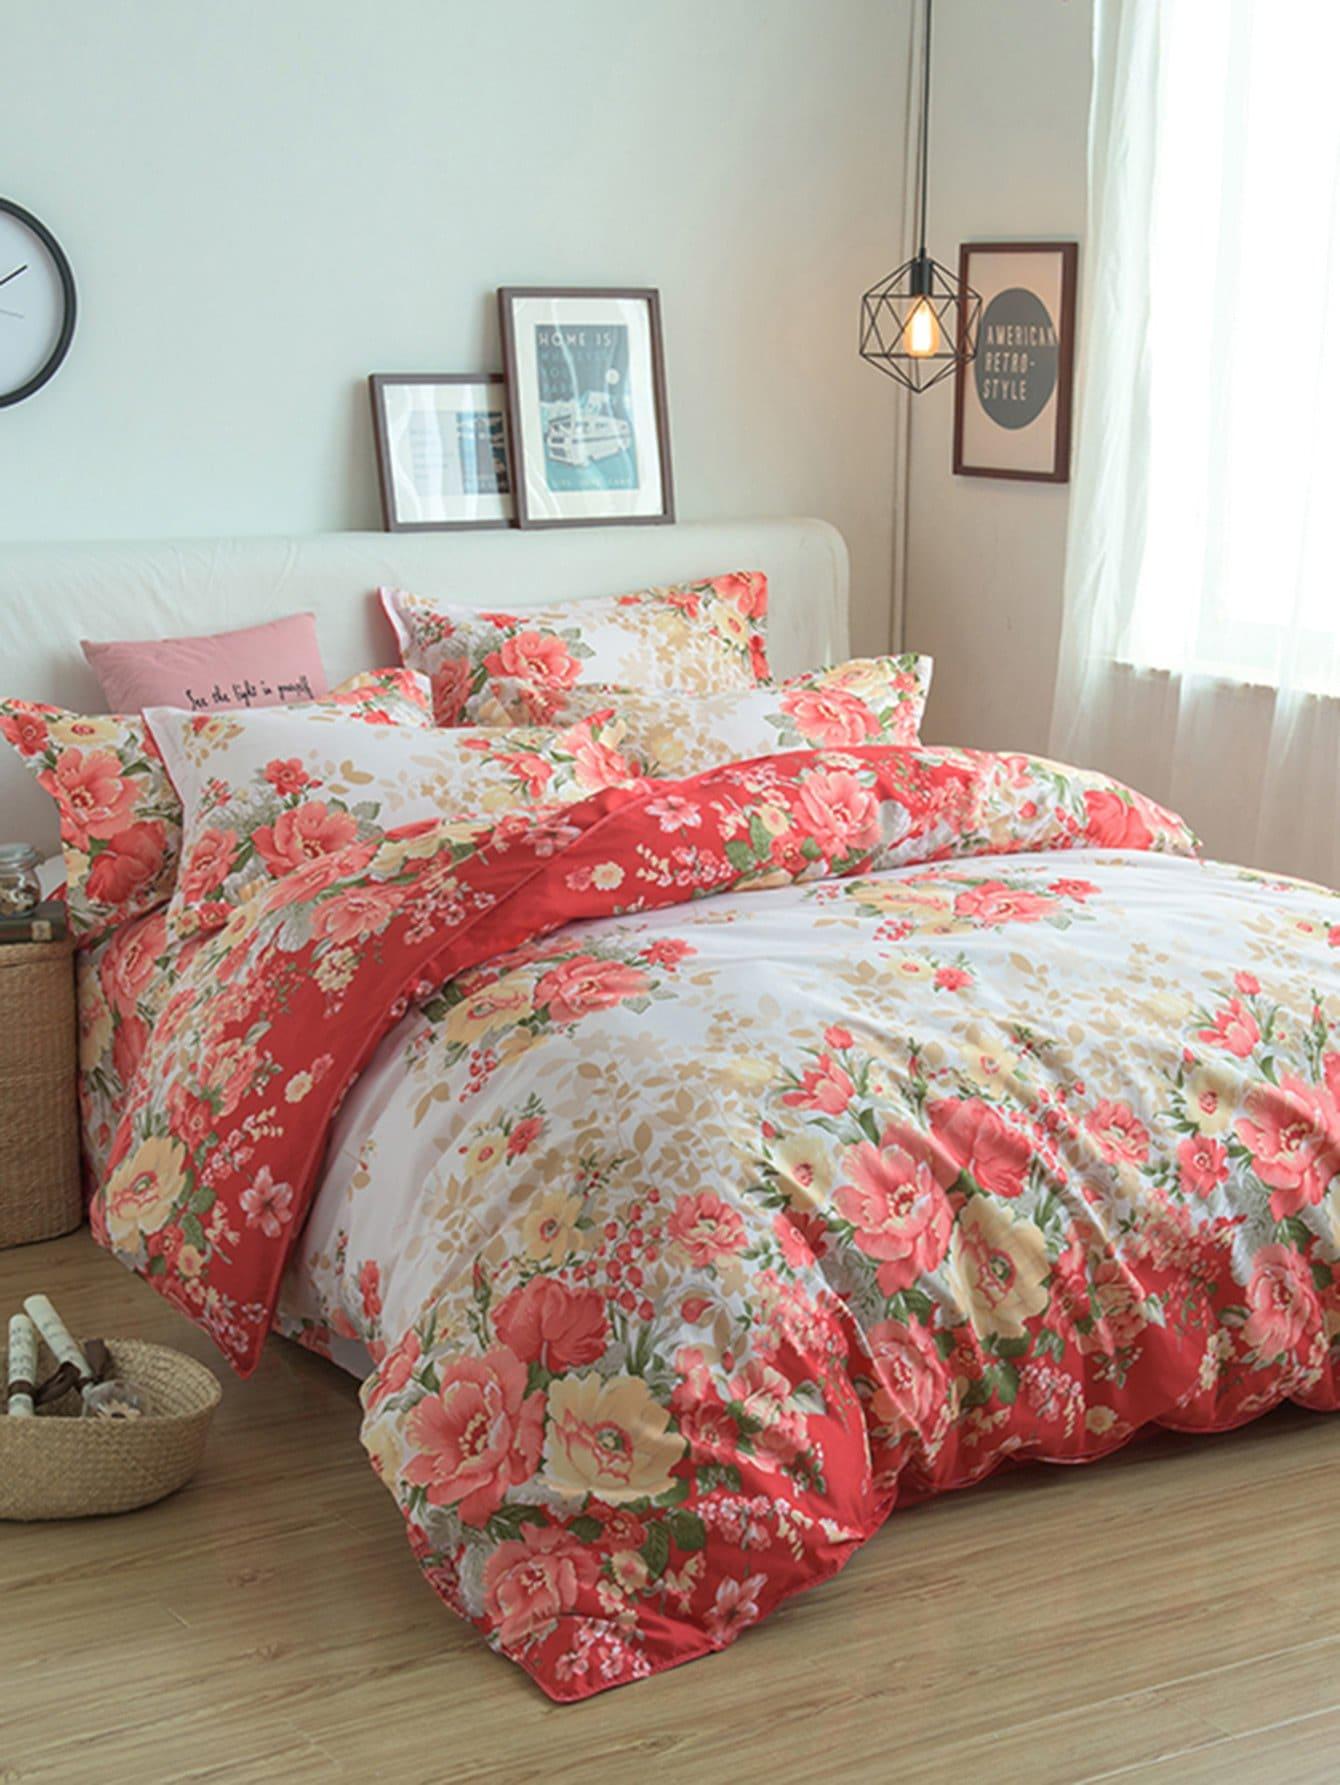 All Over Florals Print Bedding Set all over florals shirt